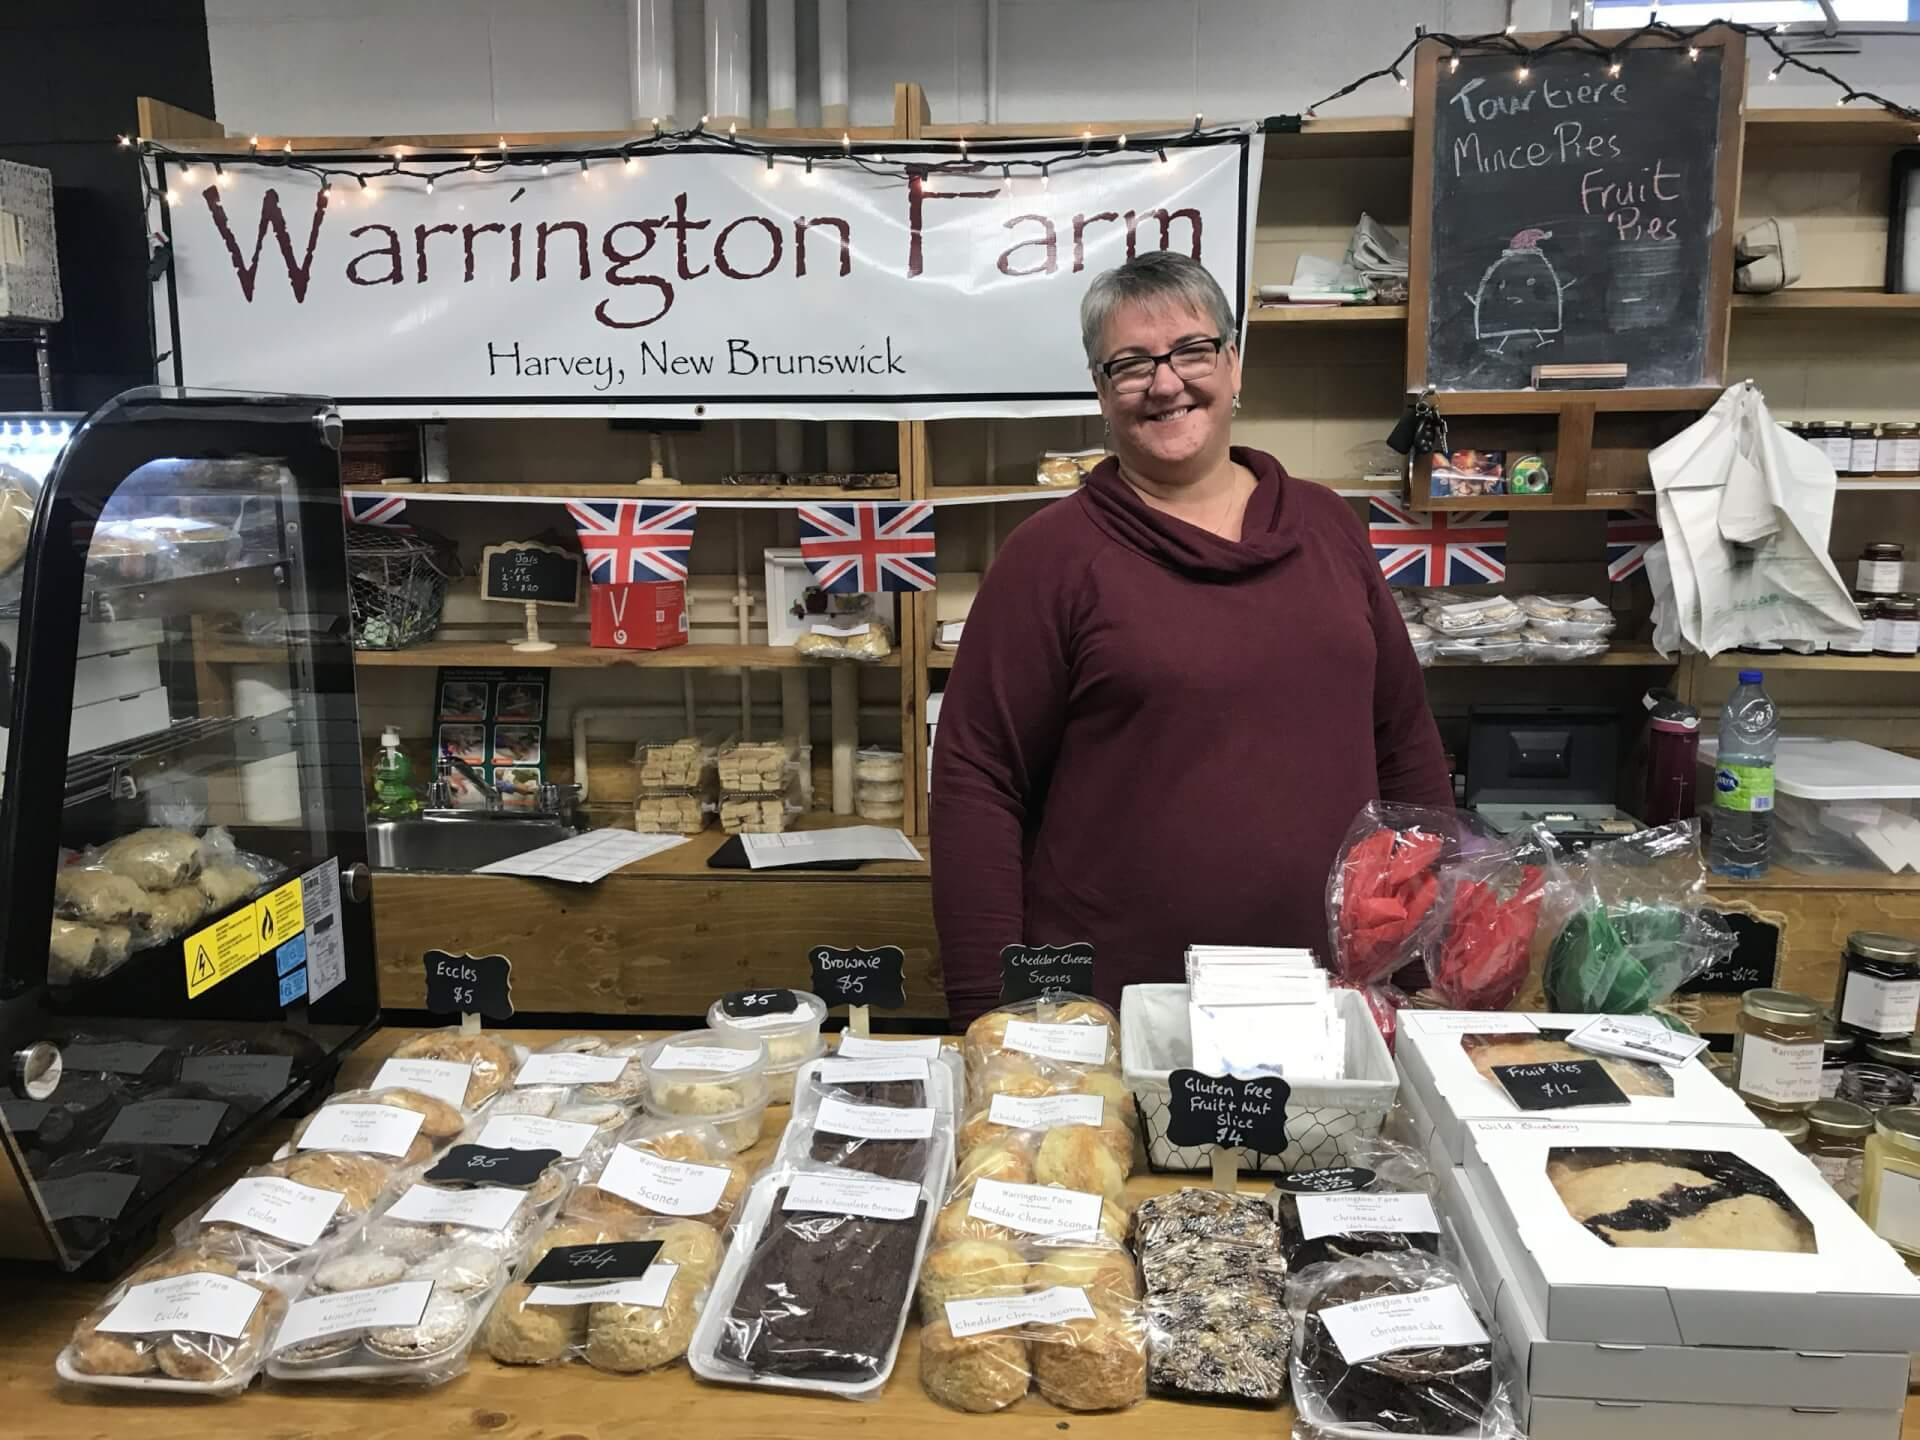 Warrington Farms